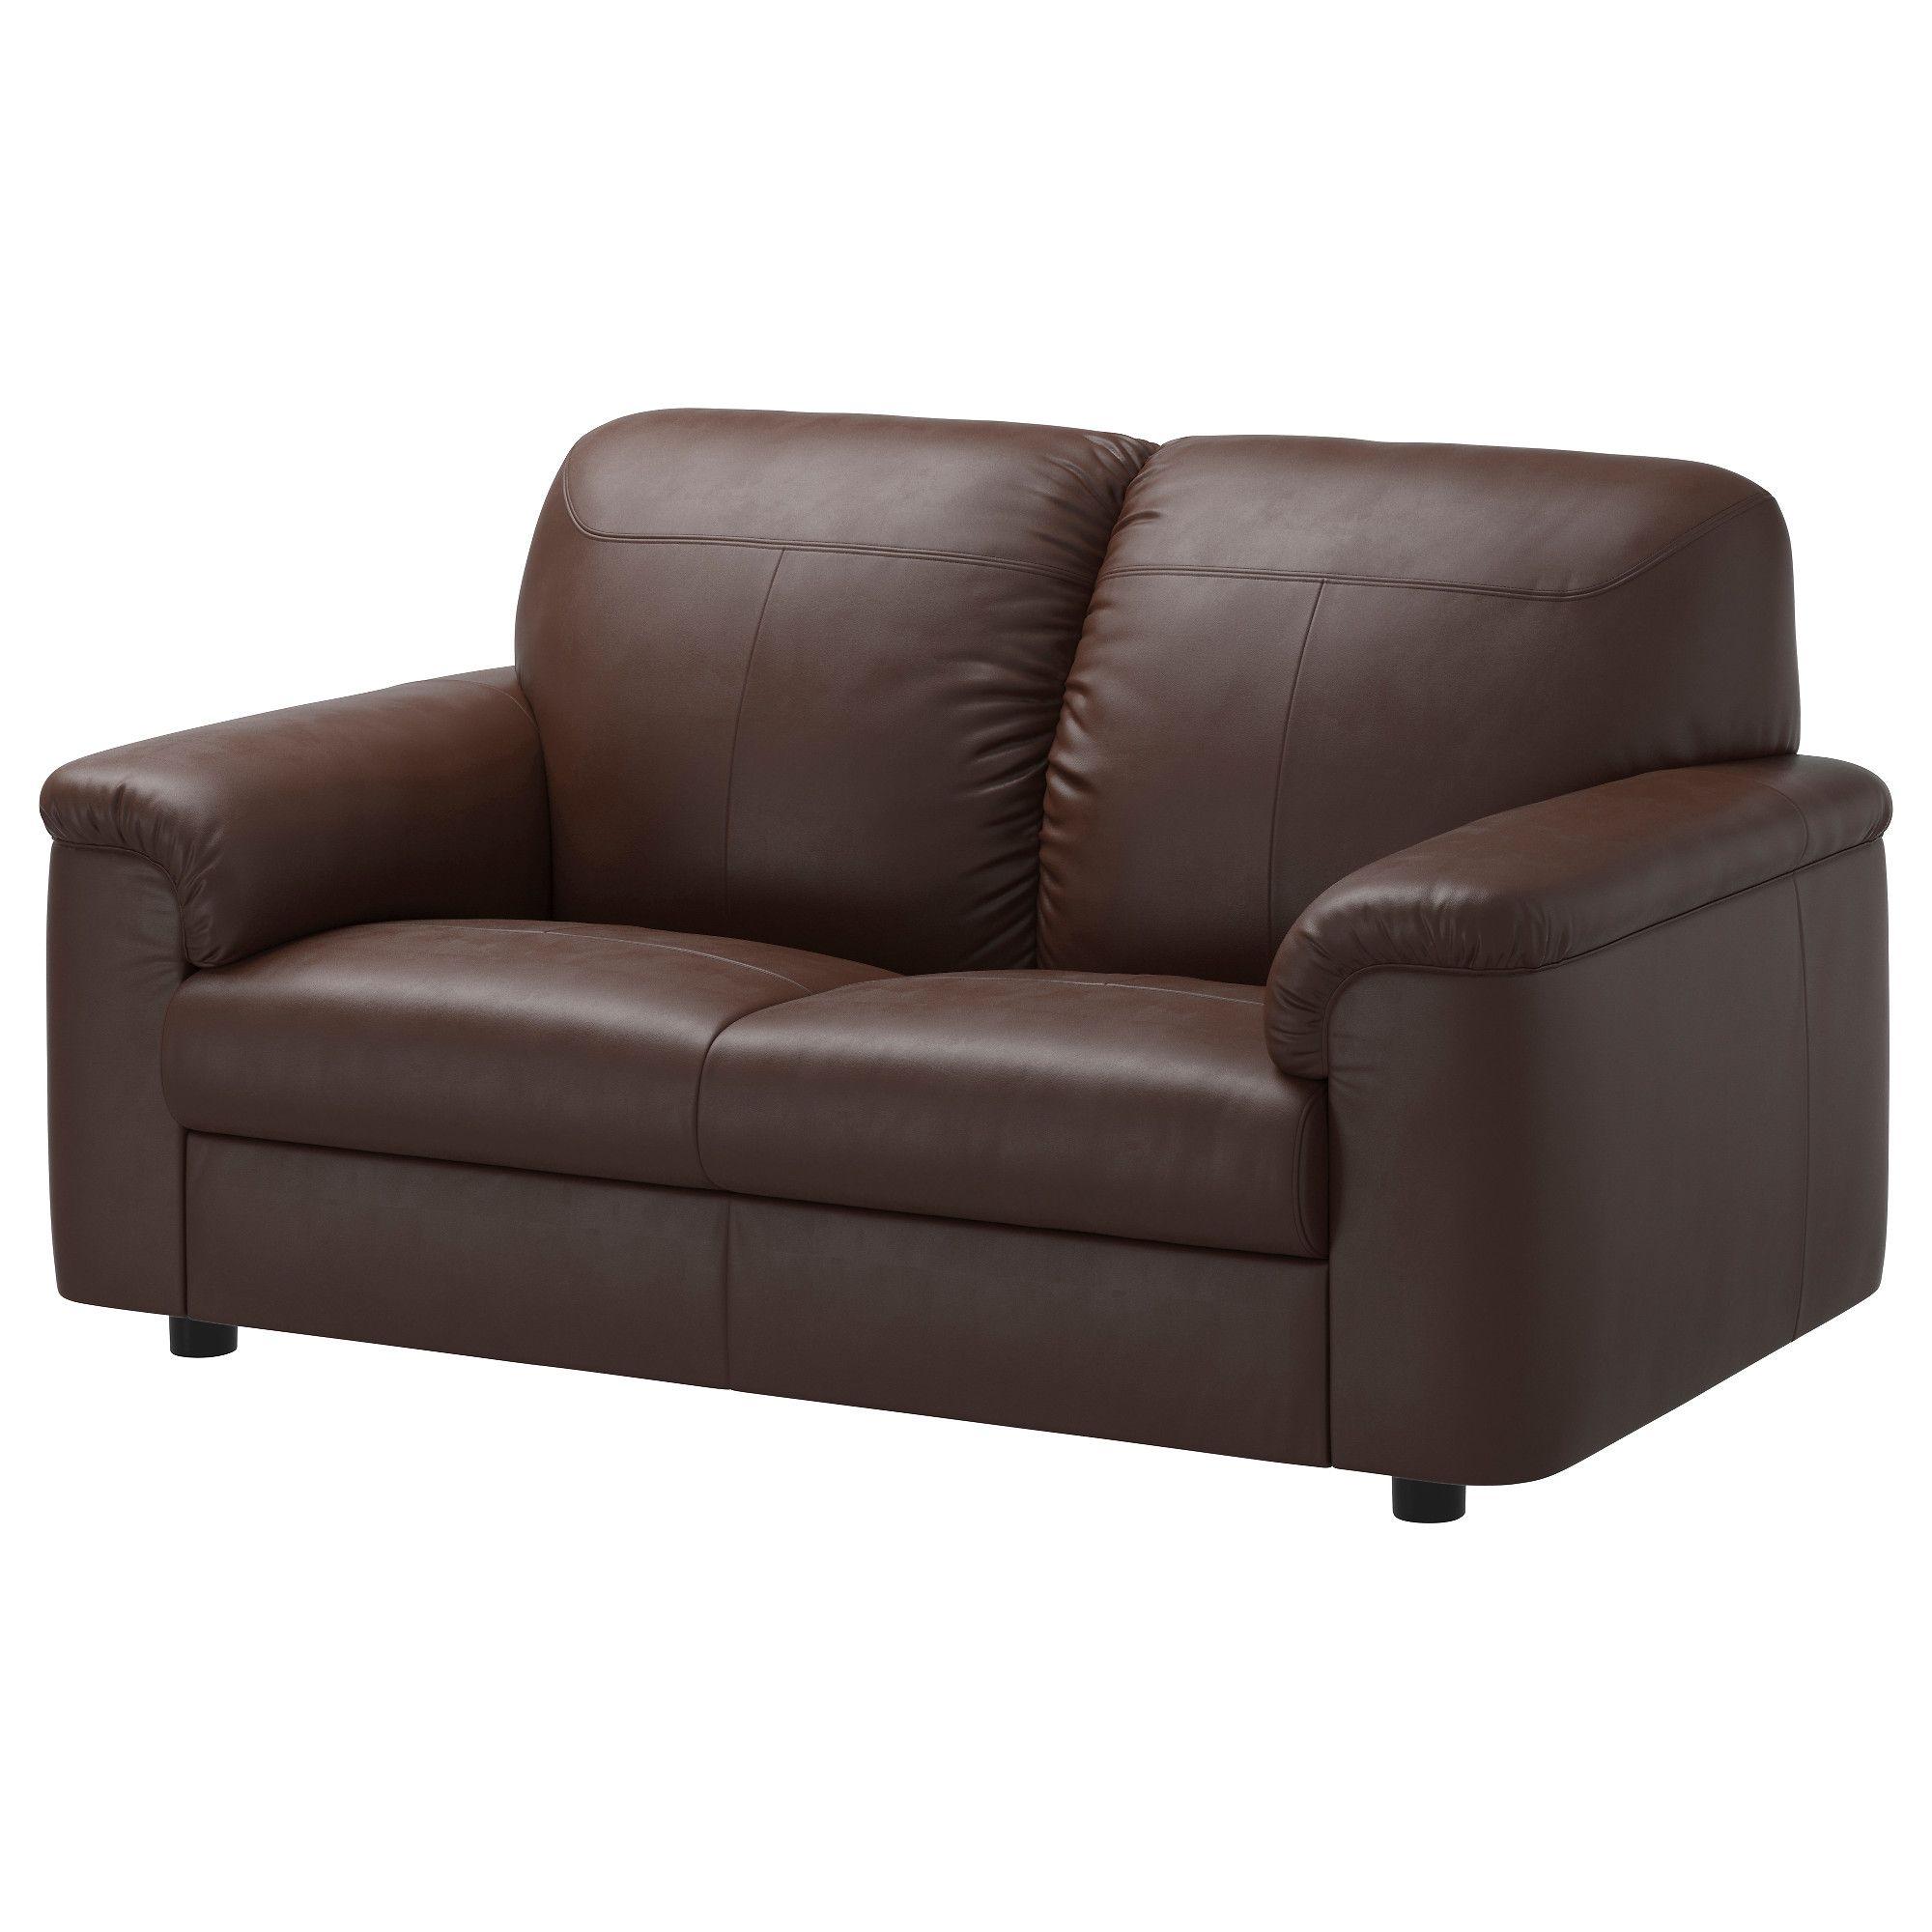 Australia Leather Sofa Bed Small